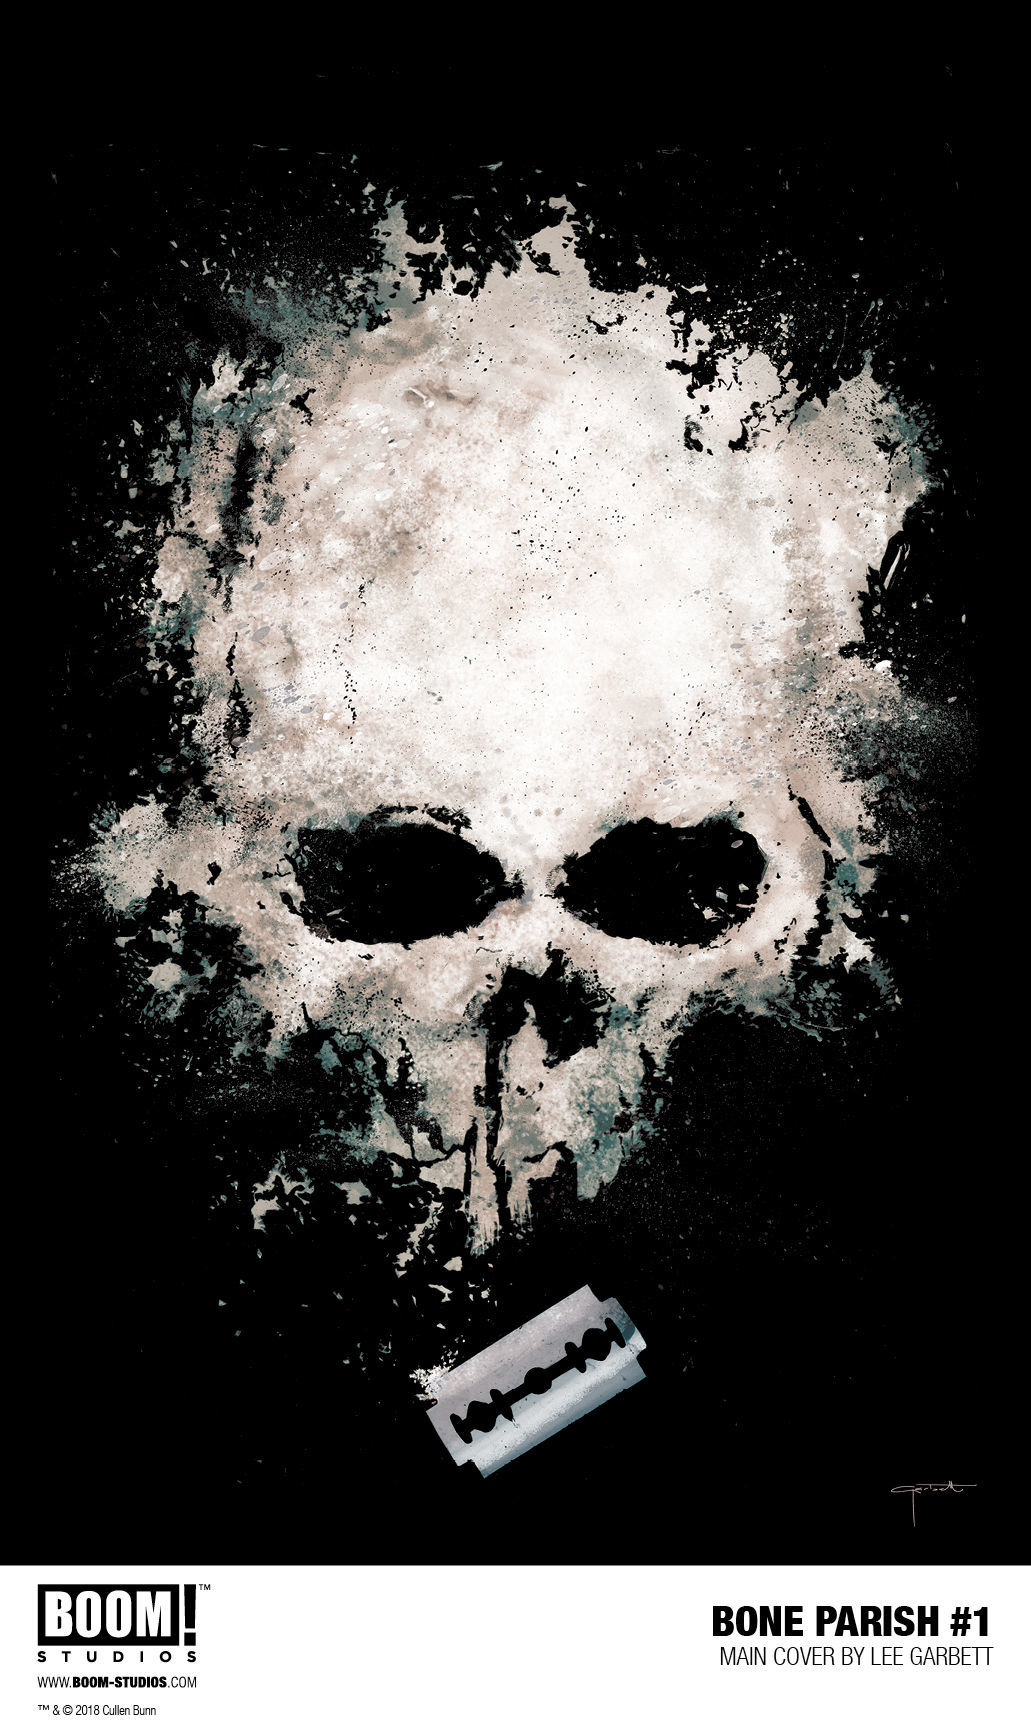 BoneParish_001_Main_PROMO